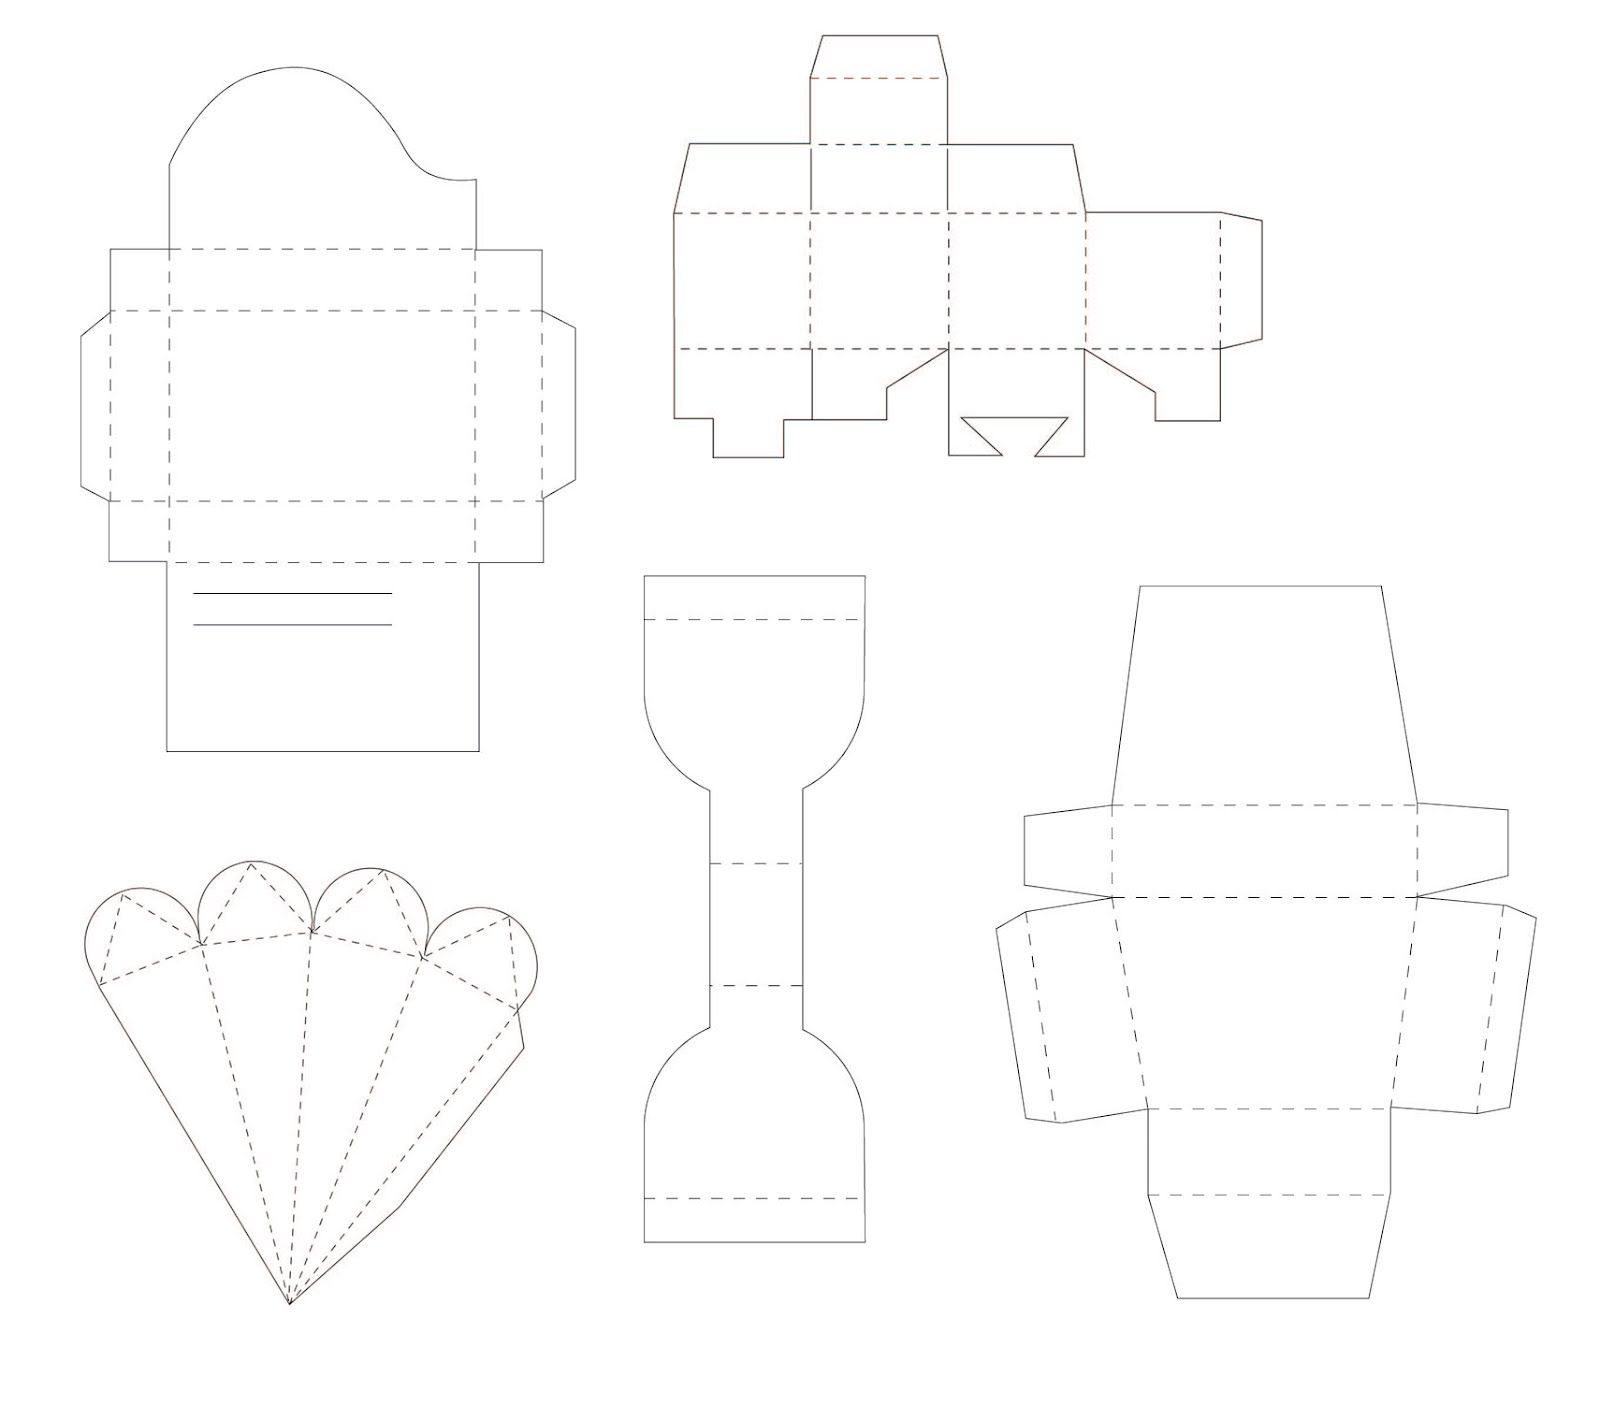 More free box templates kldezign les svg template de bo tes silhouette cameo tutorials - Silhouette cameo vorlagen ...